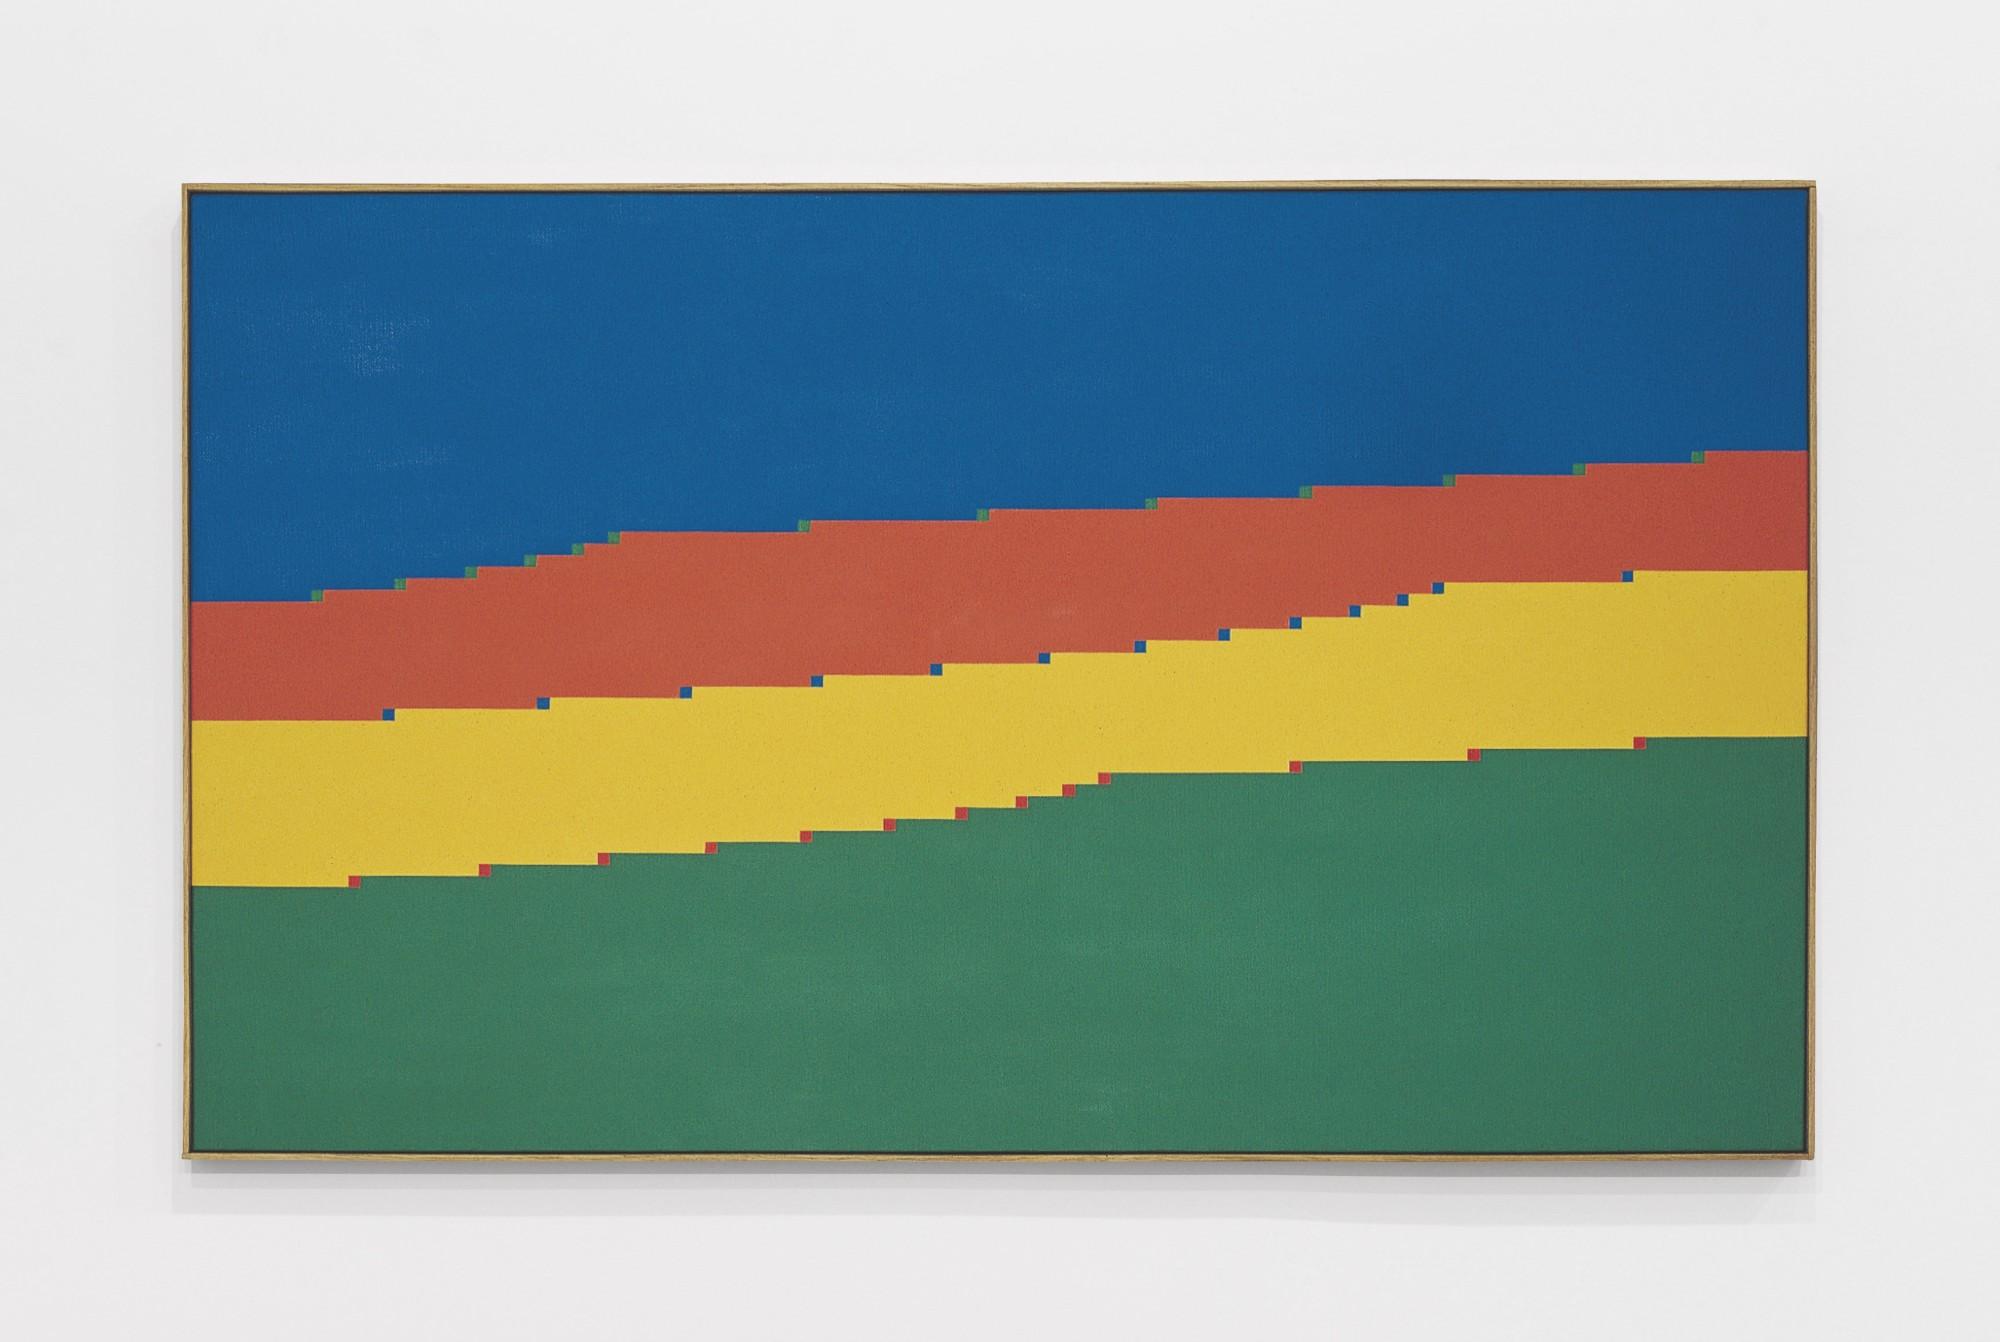 "<span class=""link fancybox-details-link""><a href=""/exhibitions/554/works/artworks_standalone10855/"">View Detail Page</a></span><div class=""artist""><span class=""artist""><strong>VERENA LOEWENSBERG</strong></span></div><div class=""title""><em>Untitled</em>, 1973</div><div class=""medium"">Oil on canvas</div><div class=""dimensions"">81 x 136 cm<br />31 ⅞ x 53 ½ inches</div>"